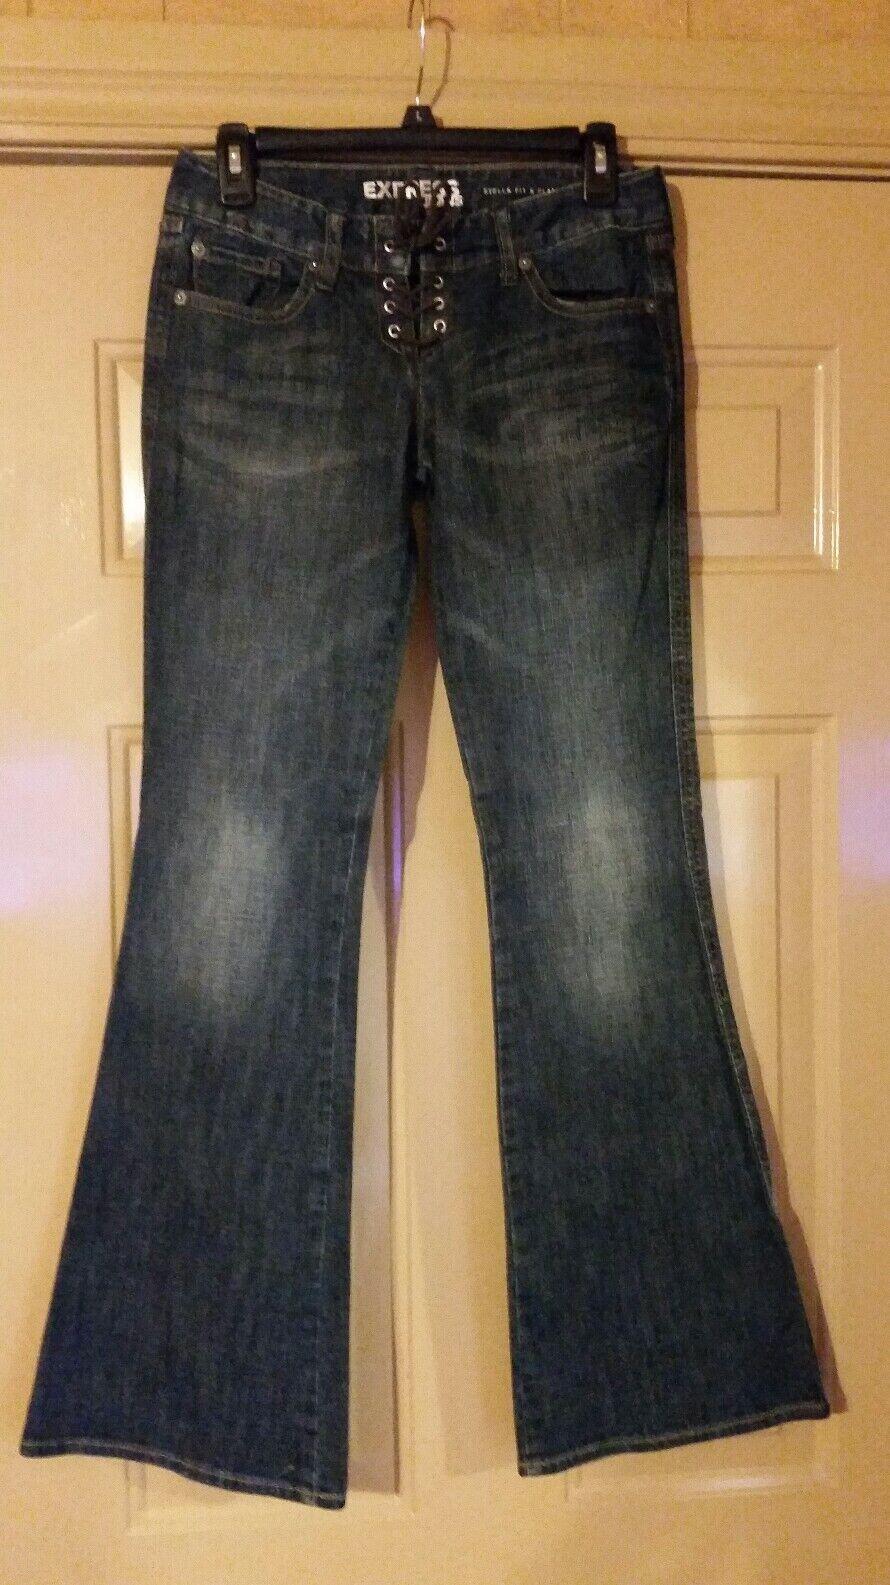 Express Stella Jeans Size 2 Lace Up Front Flare Leg Stretch Cotton Vintage